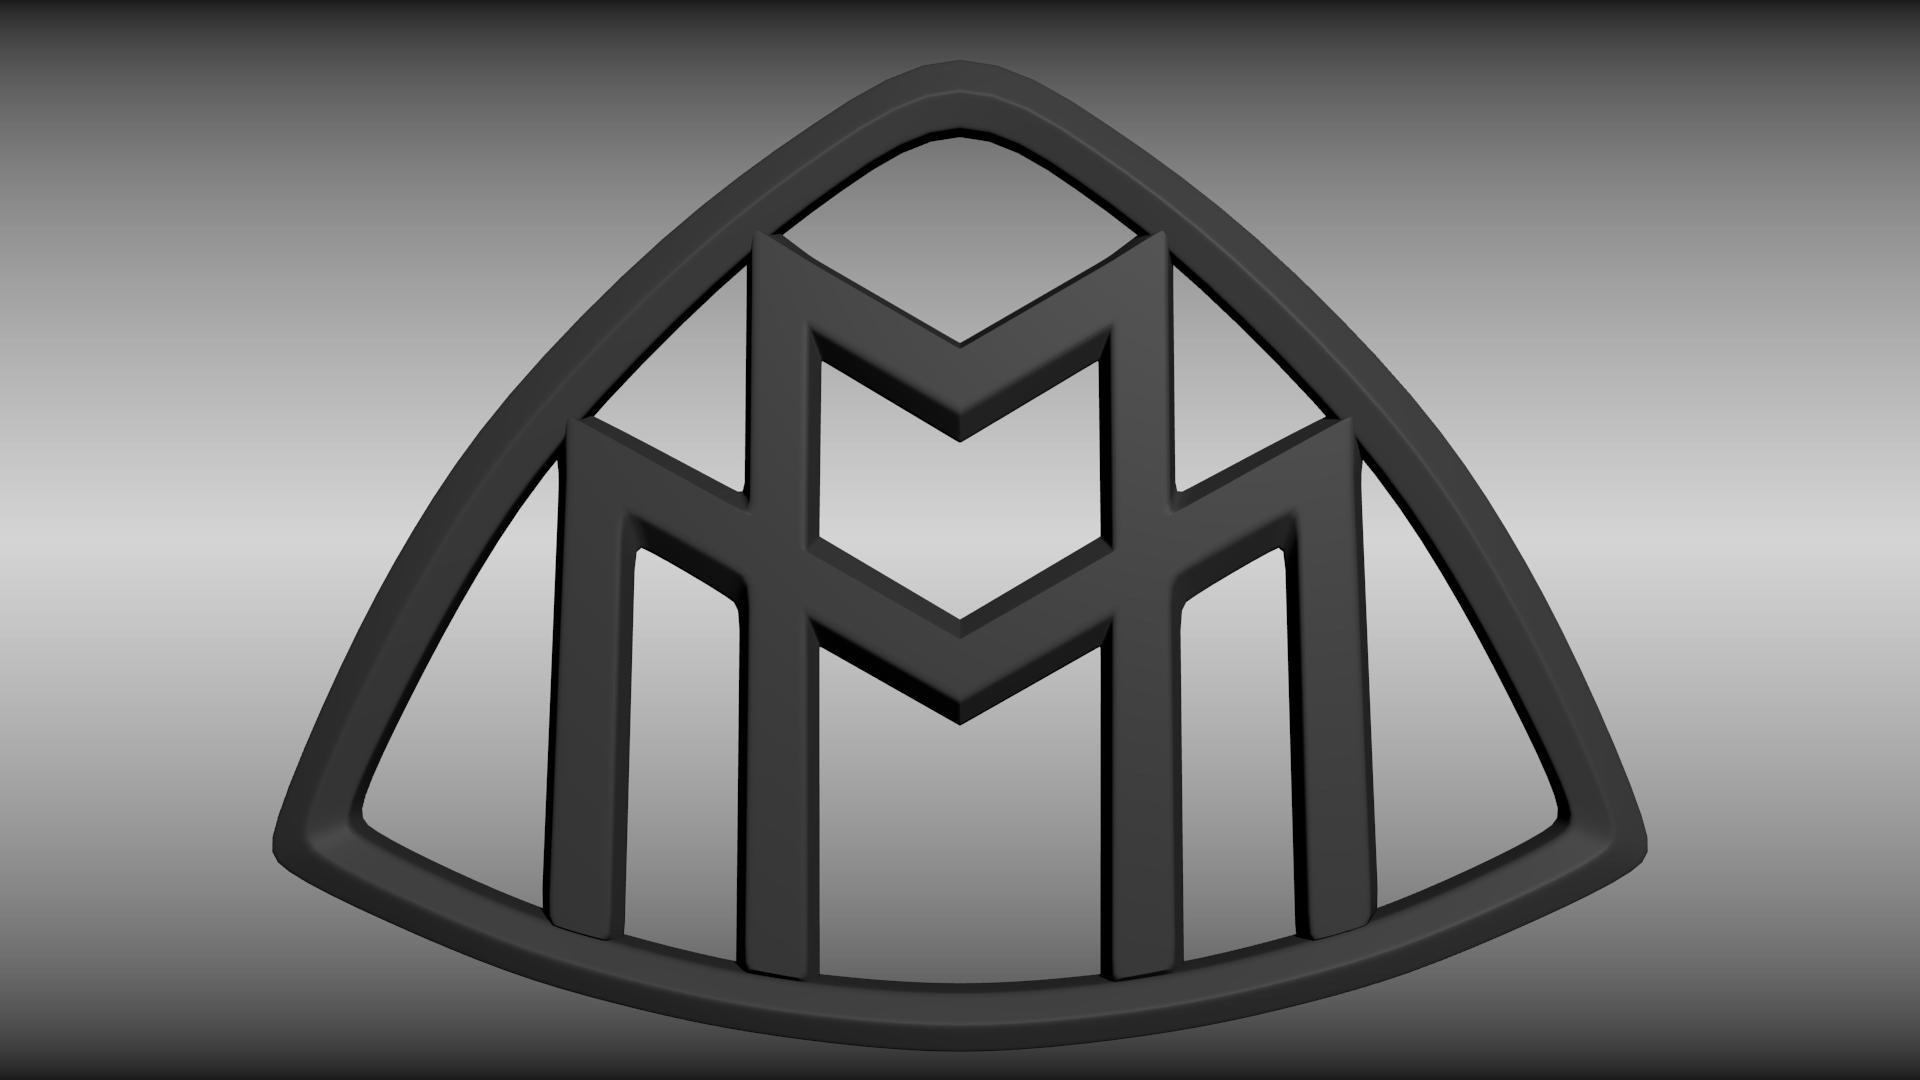 Maybach Symbol >> Maybach logo 3D Model .obj .blend - CGTrader.com